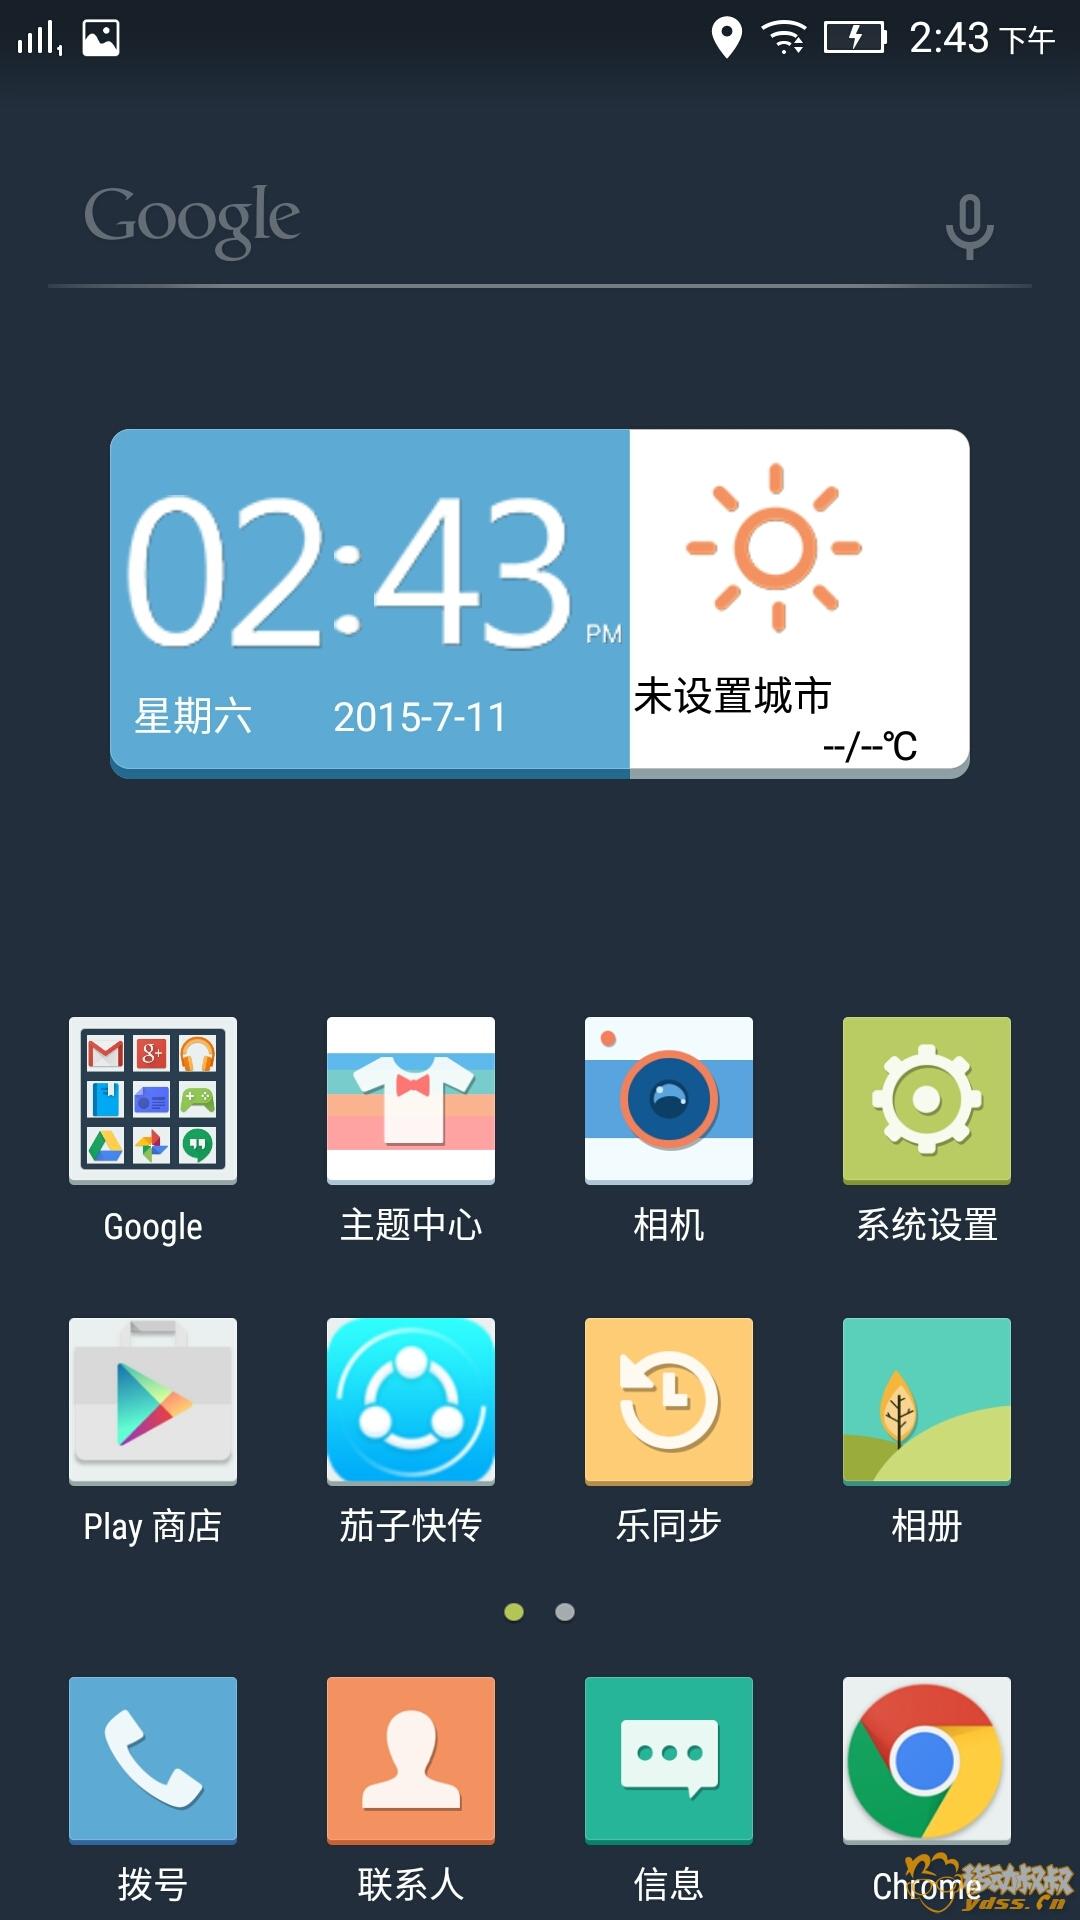 Screenshot_2015-07-11-14-43-42-551.jpeg